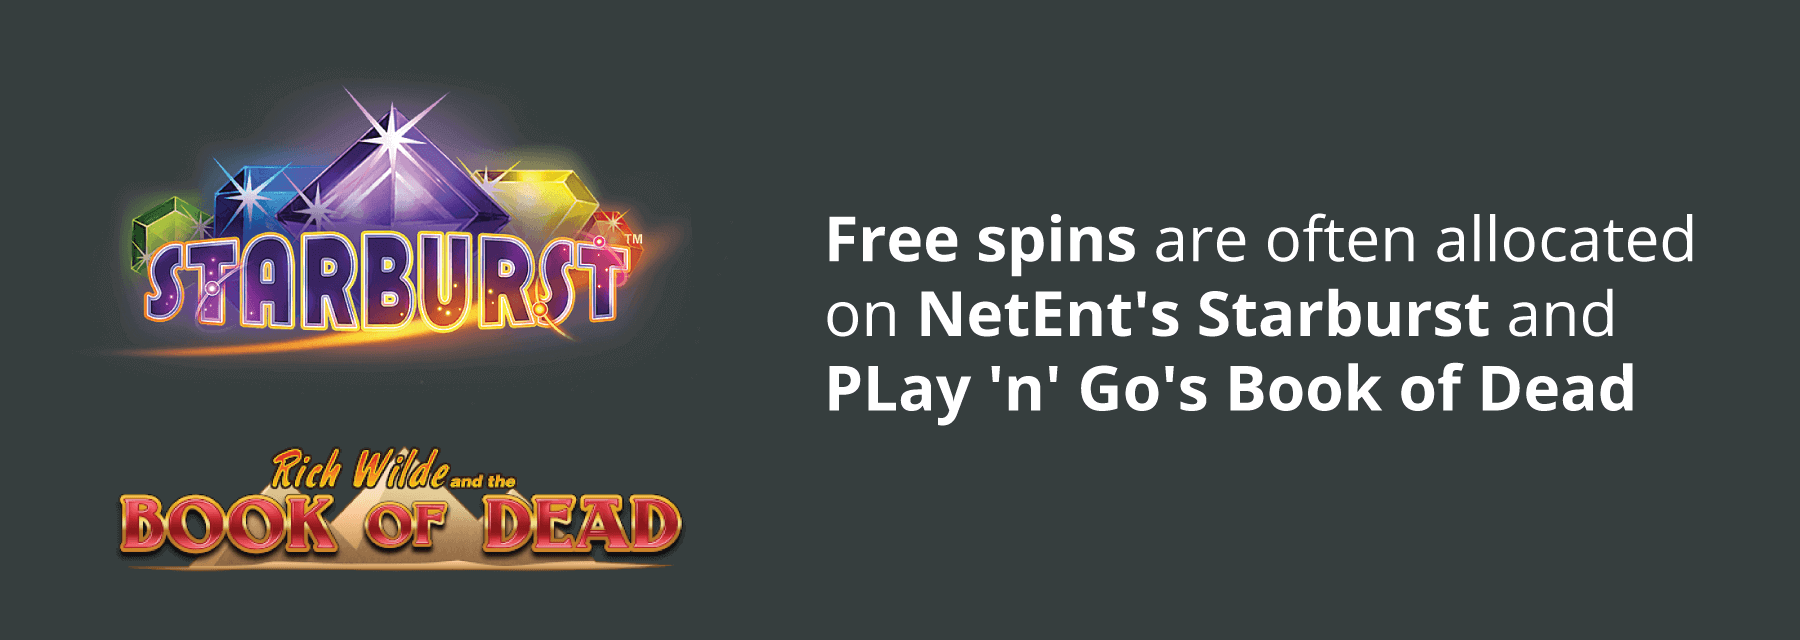 Free spins on popular slots